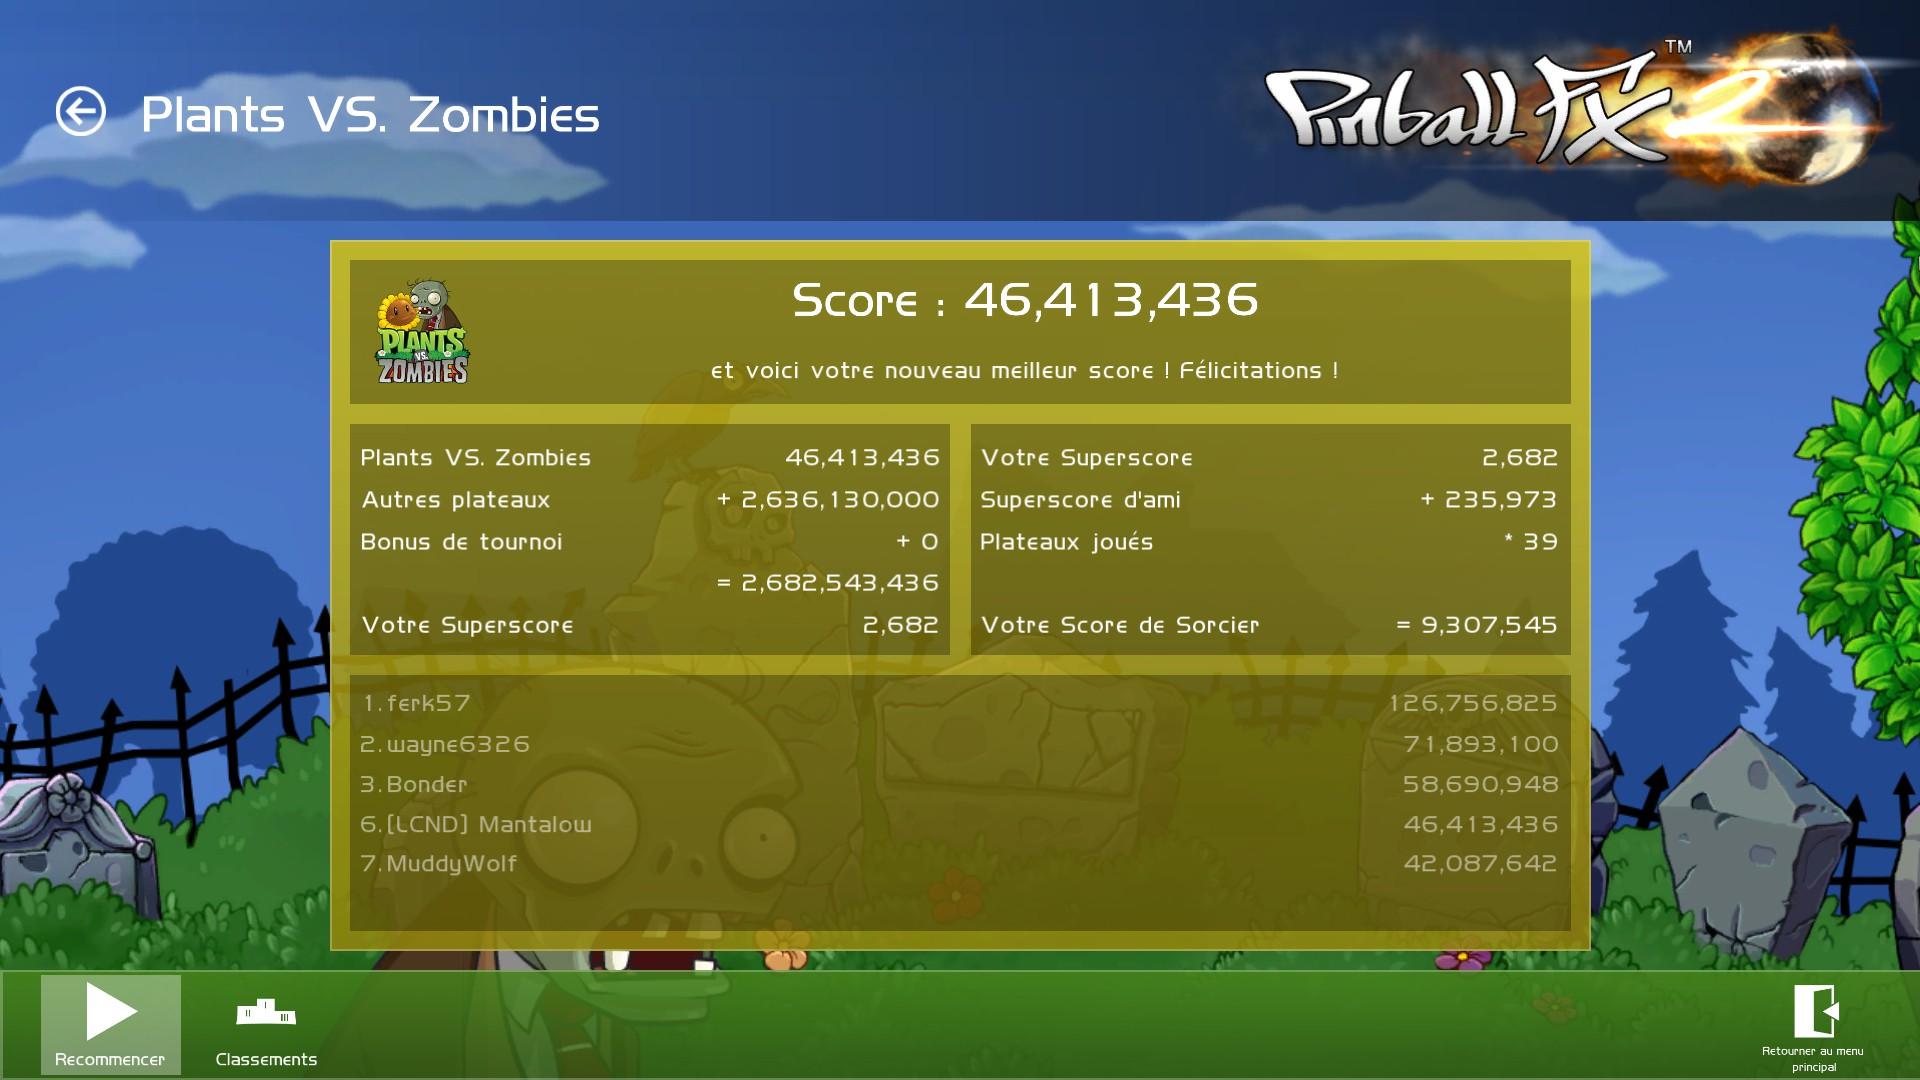 Mantalow: Pinball FX 2: Plants vs Zombies (PC) 46,413,436 points on 2015-03-05 10:06:51